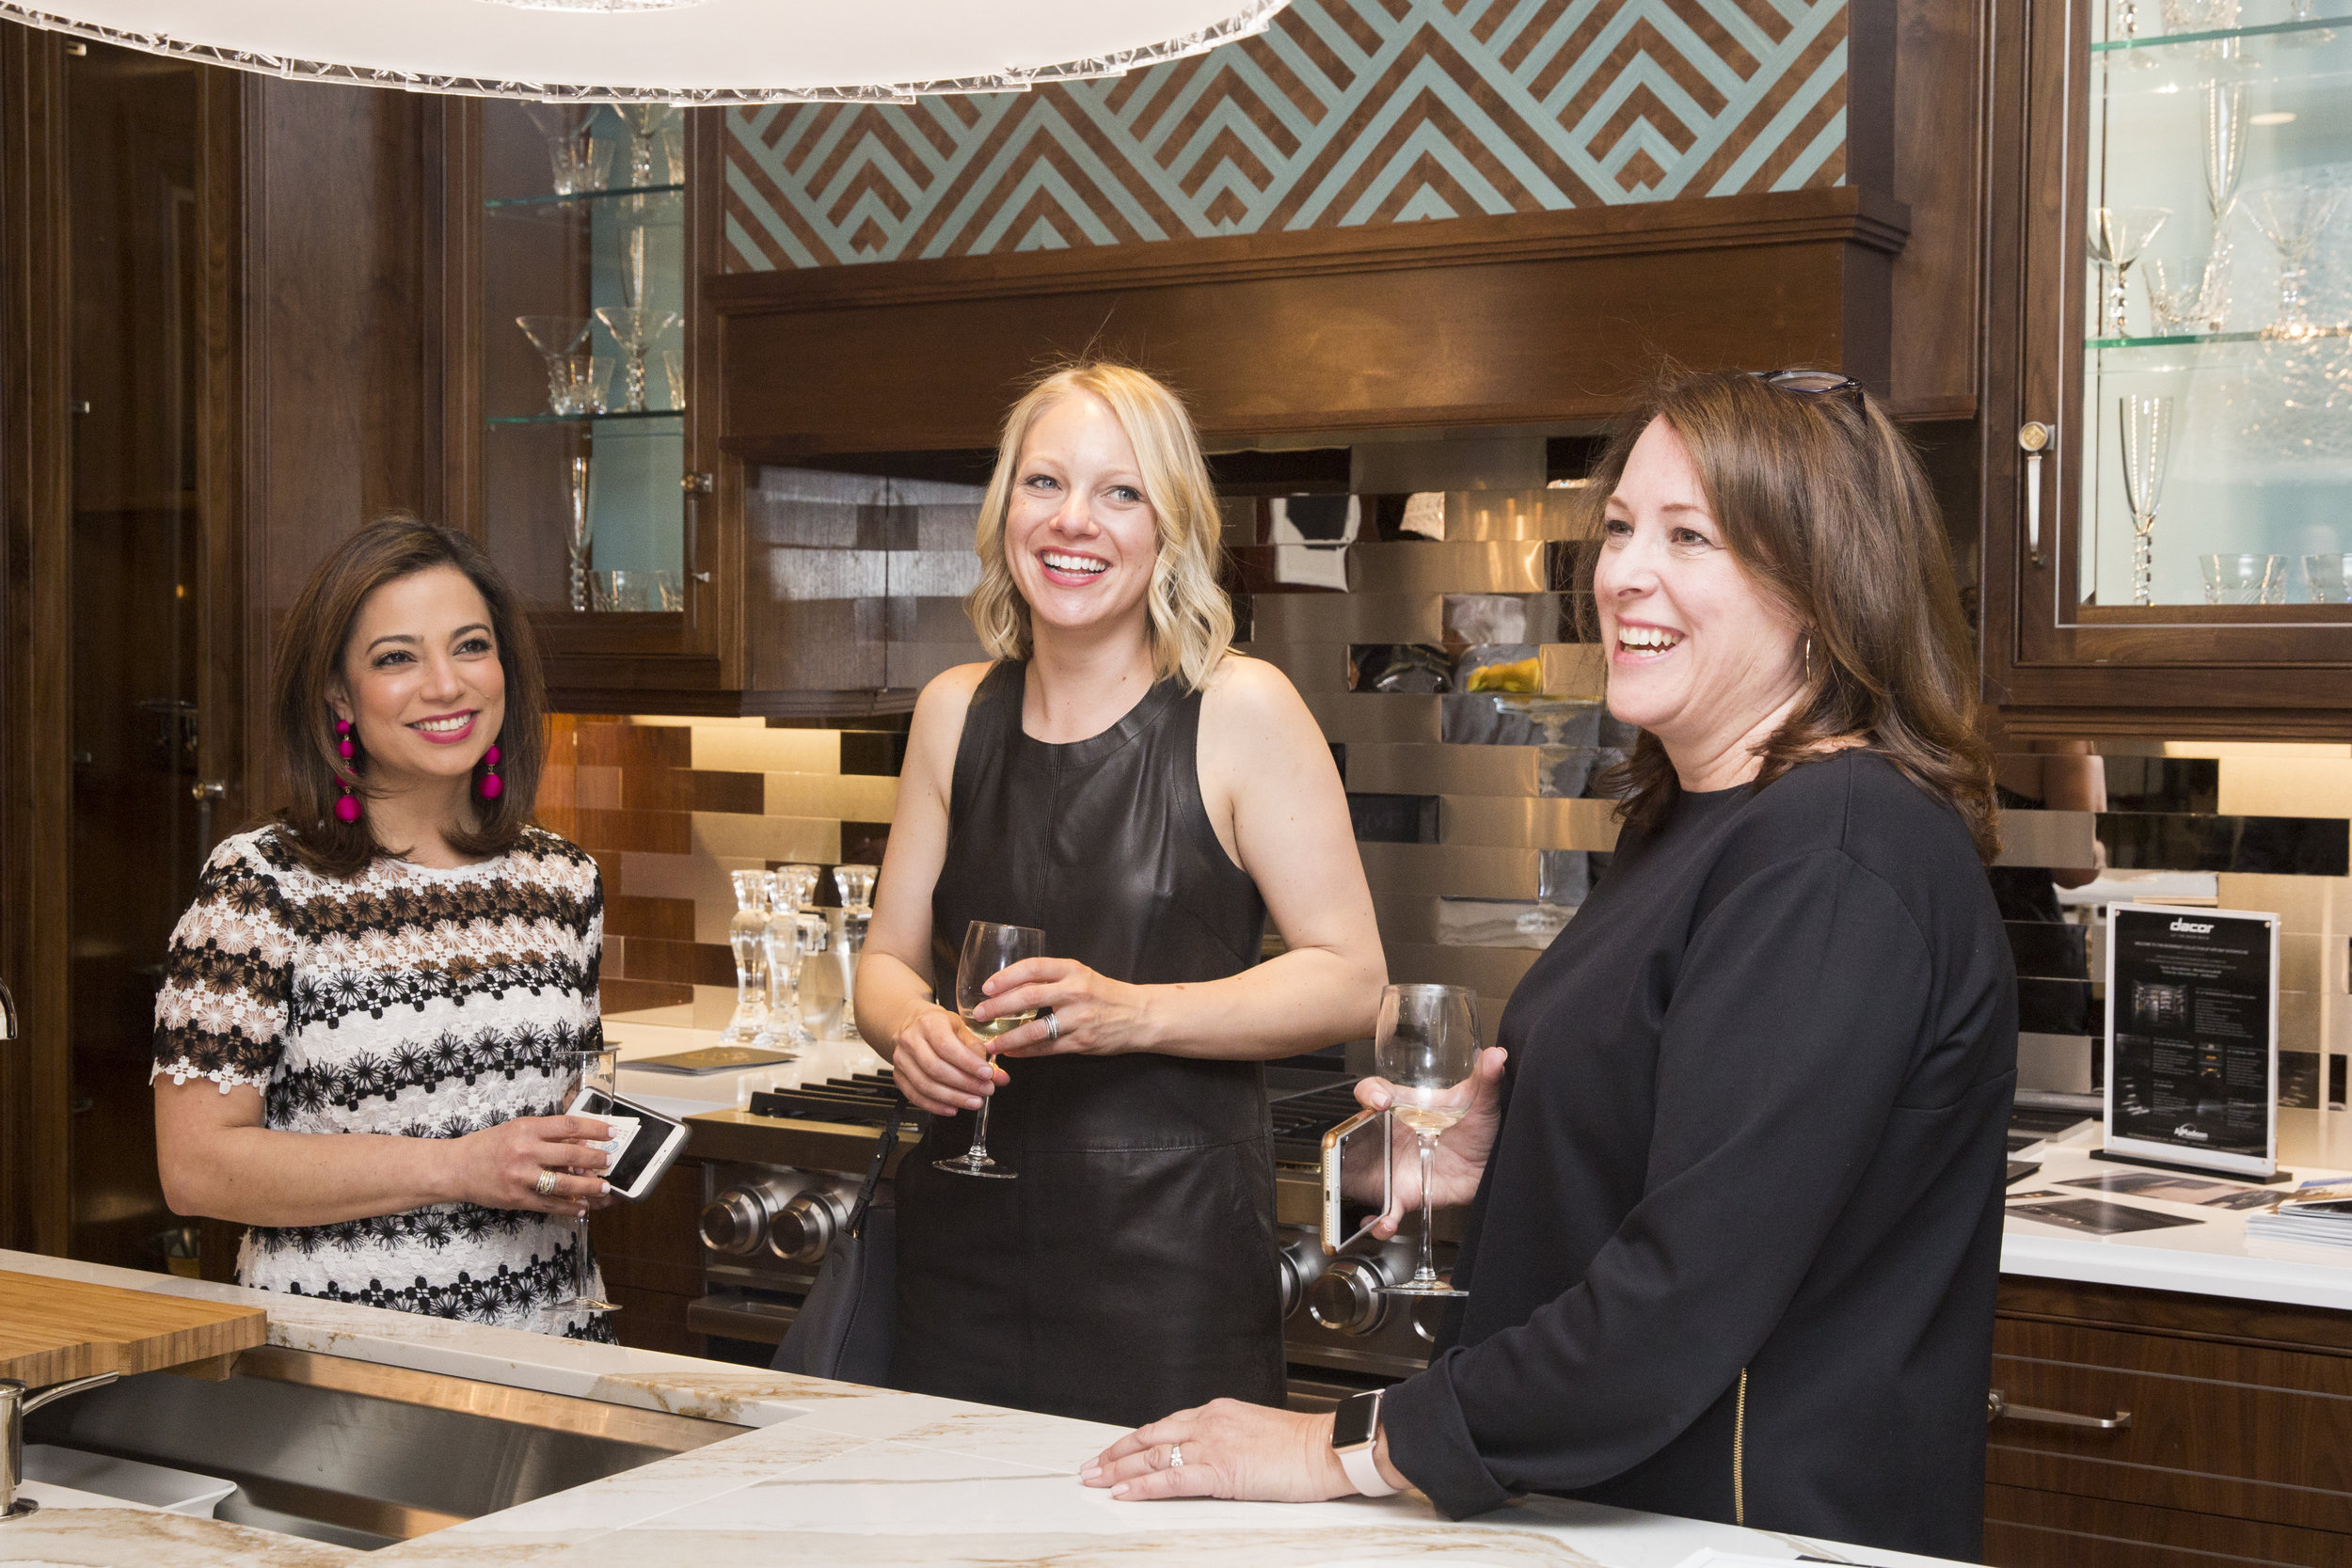 Nazira Handal of Kips Bay with Kohler's Betsy Froelich, and Beth Bouck